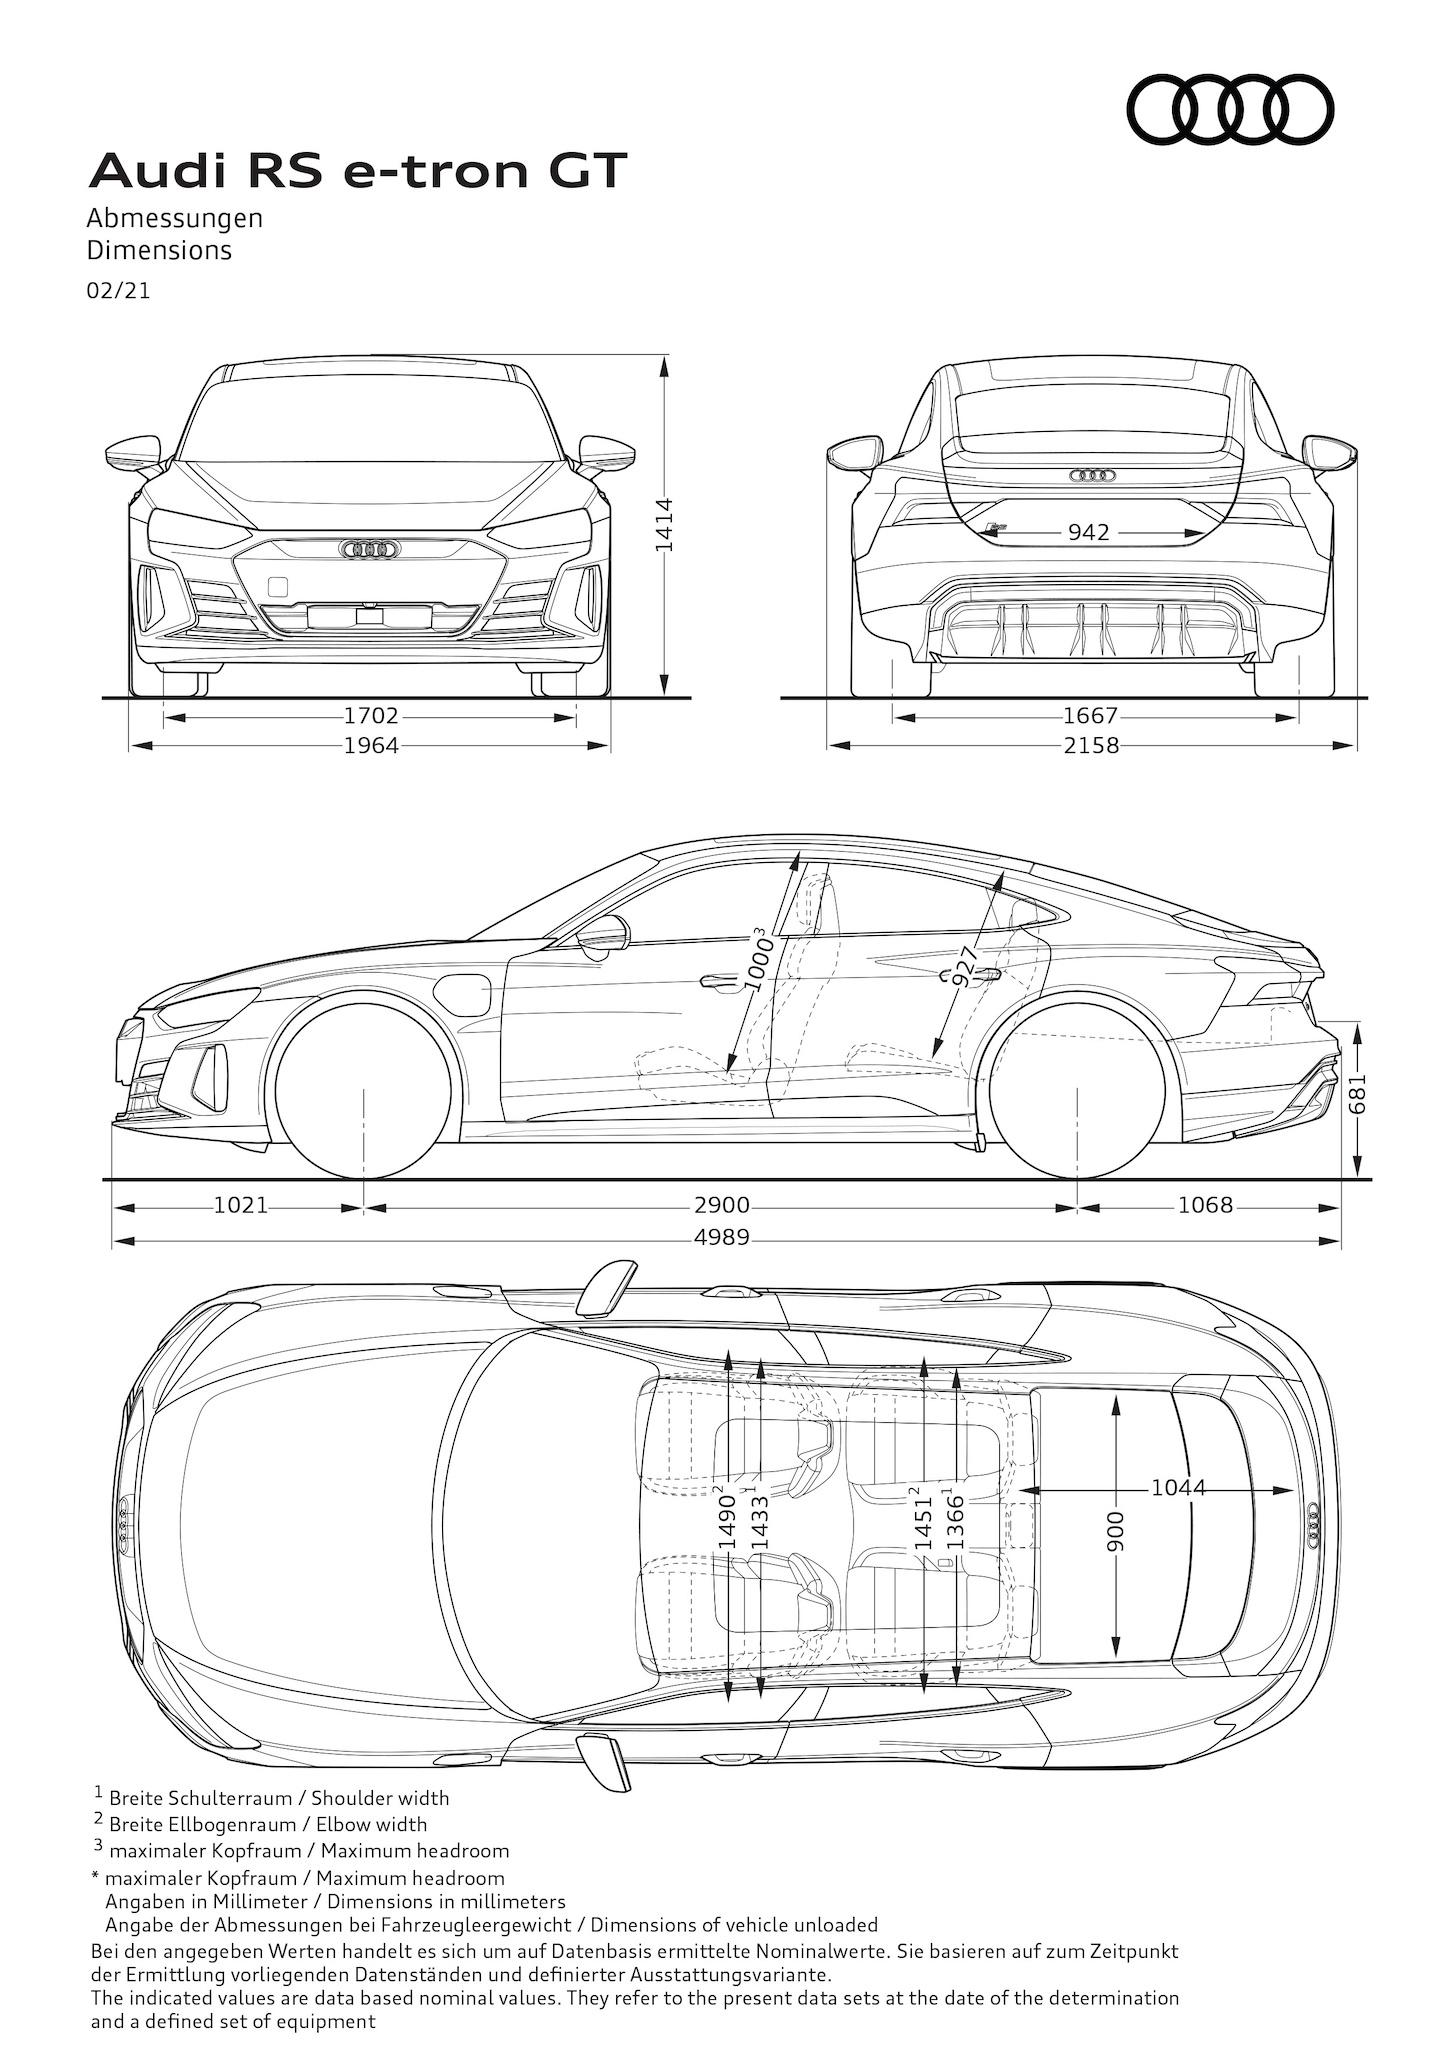 Audi RS e-tron GT 尺寸表。